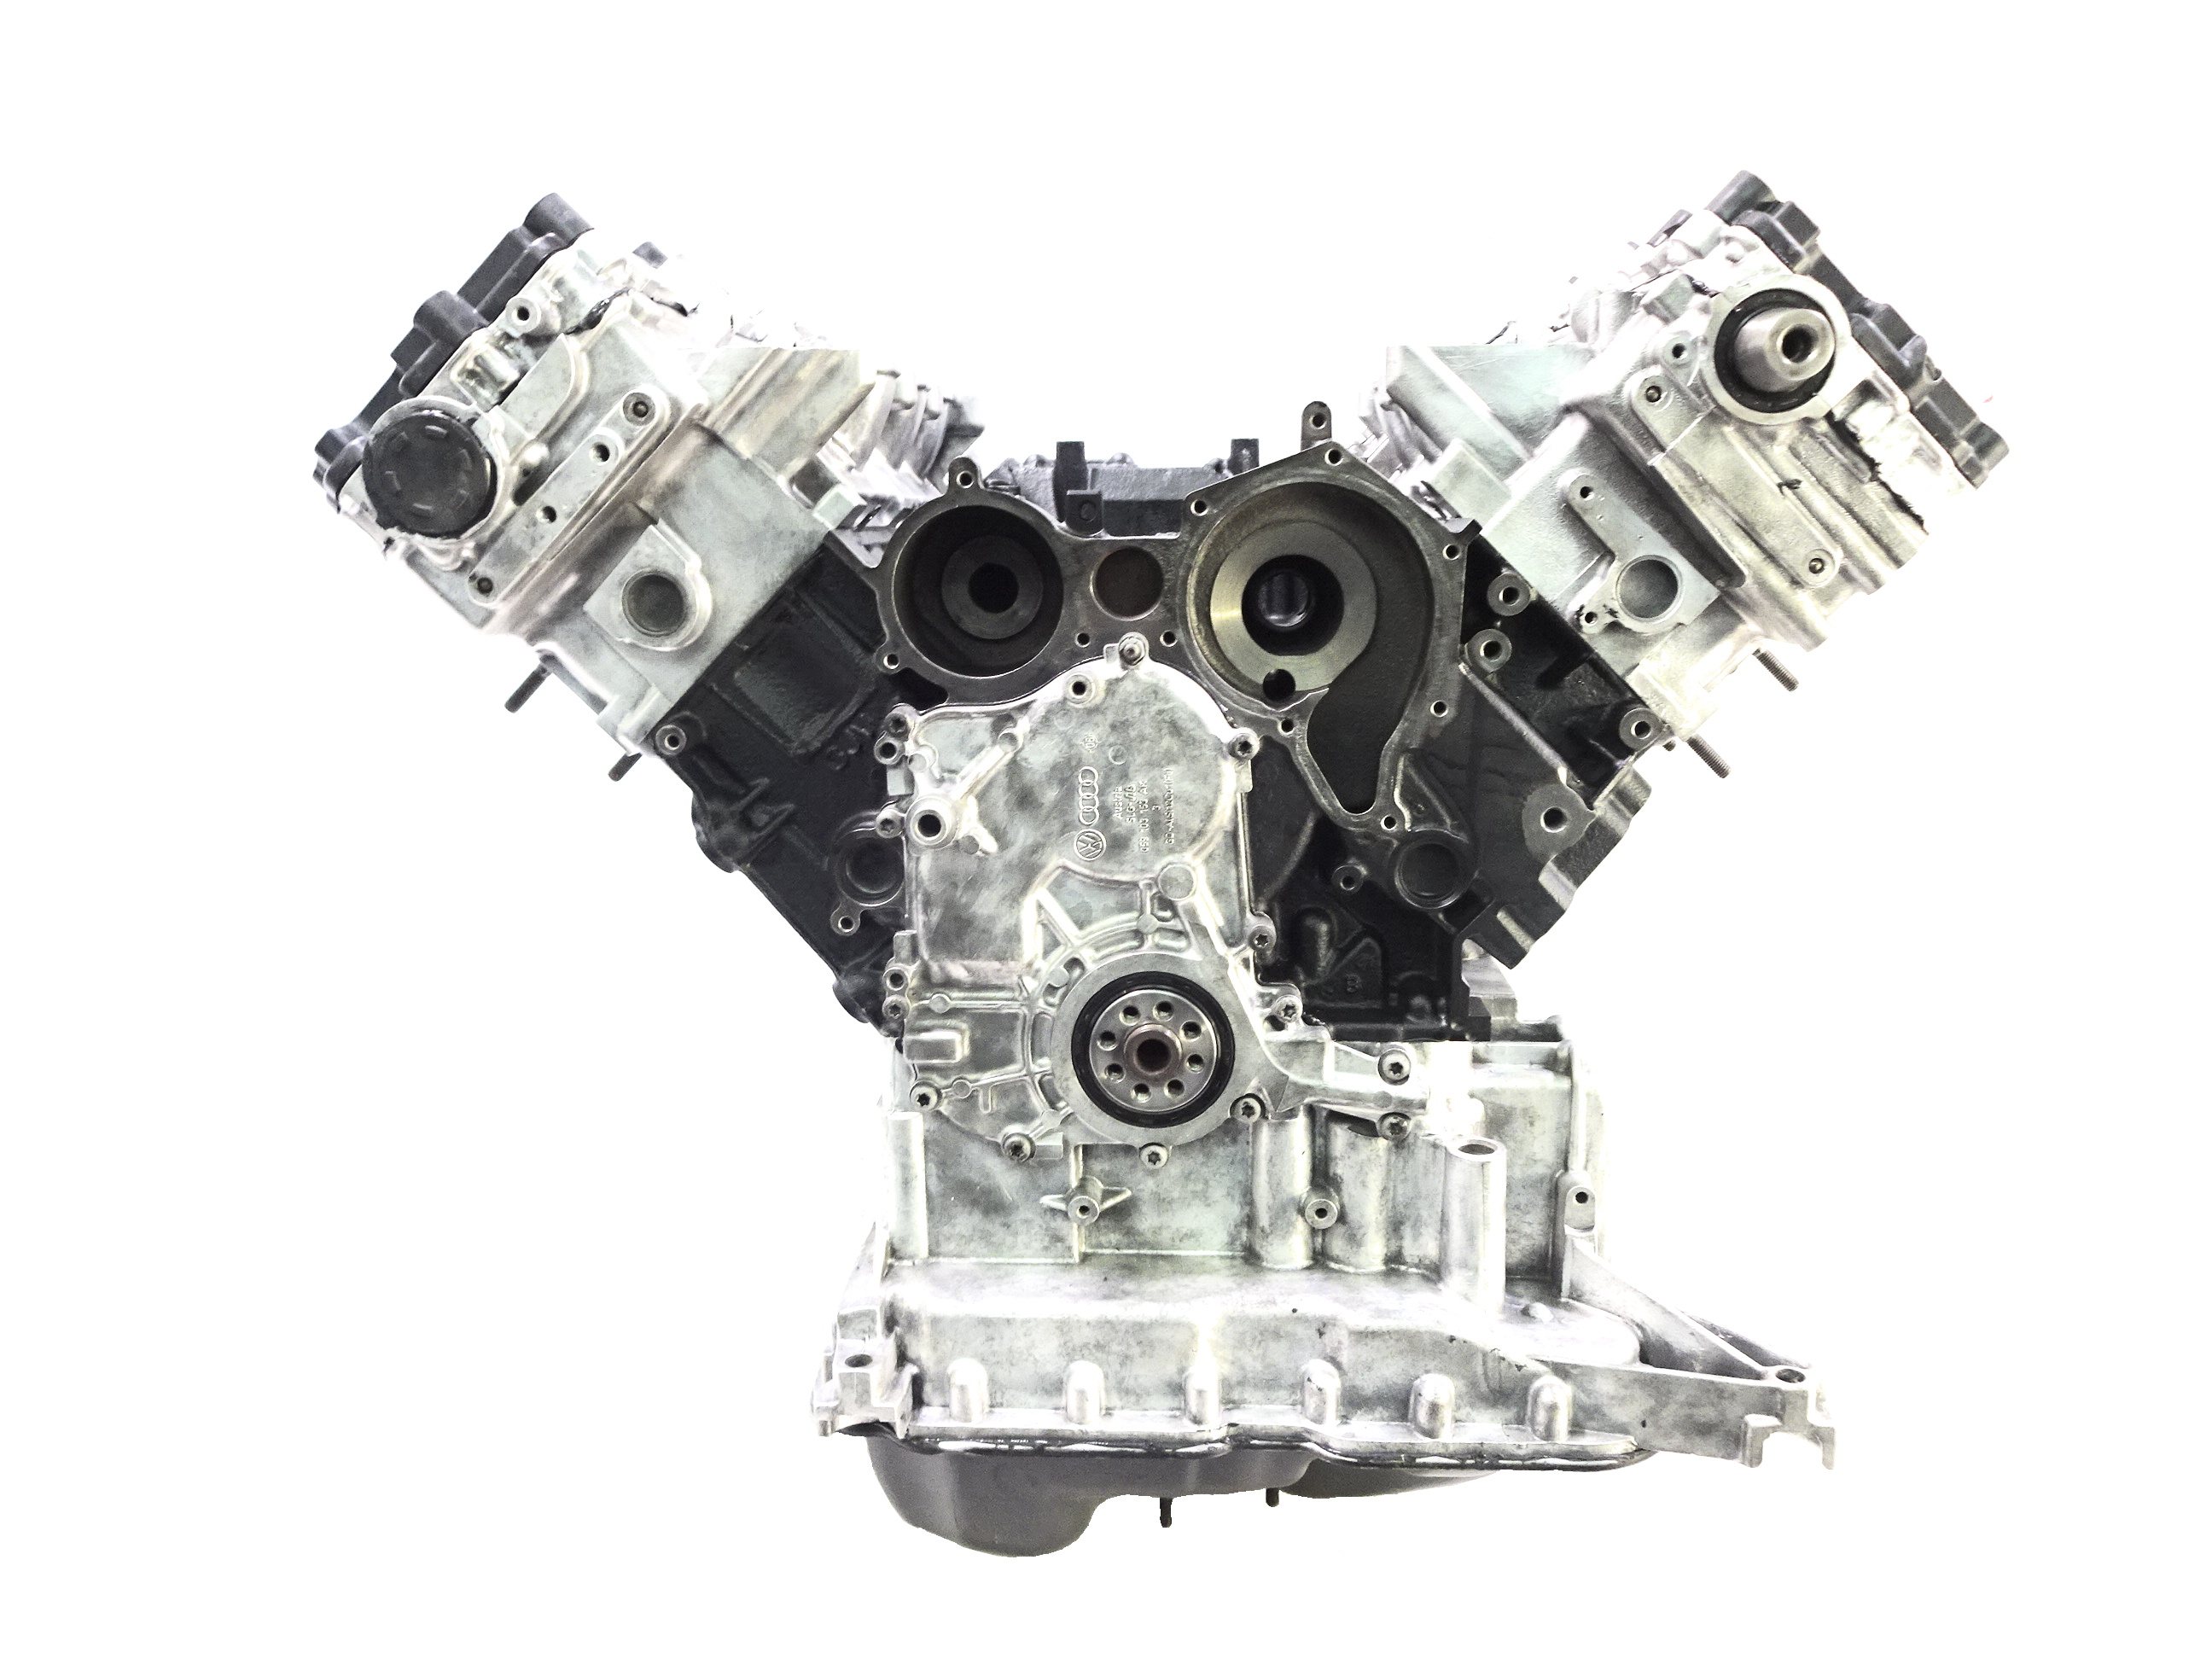 Motor 2006 Audi Q7 4LB 3,0 TDI Quattro BUG Kettensatz Dichtung NEU Köpfe geplant